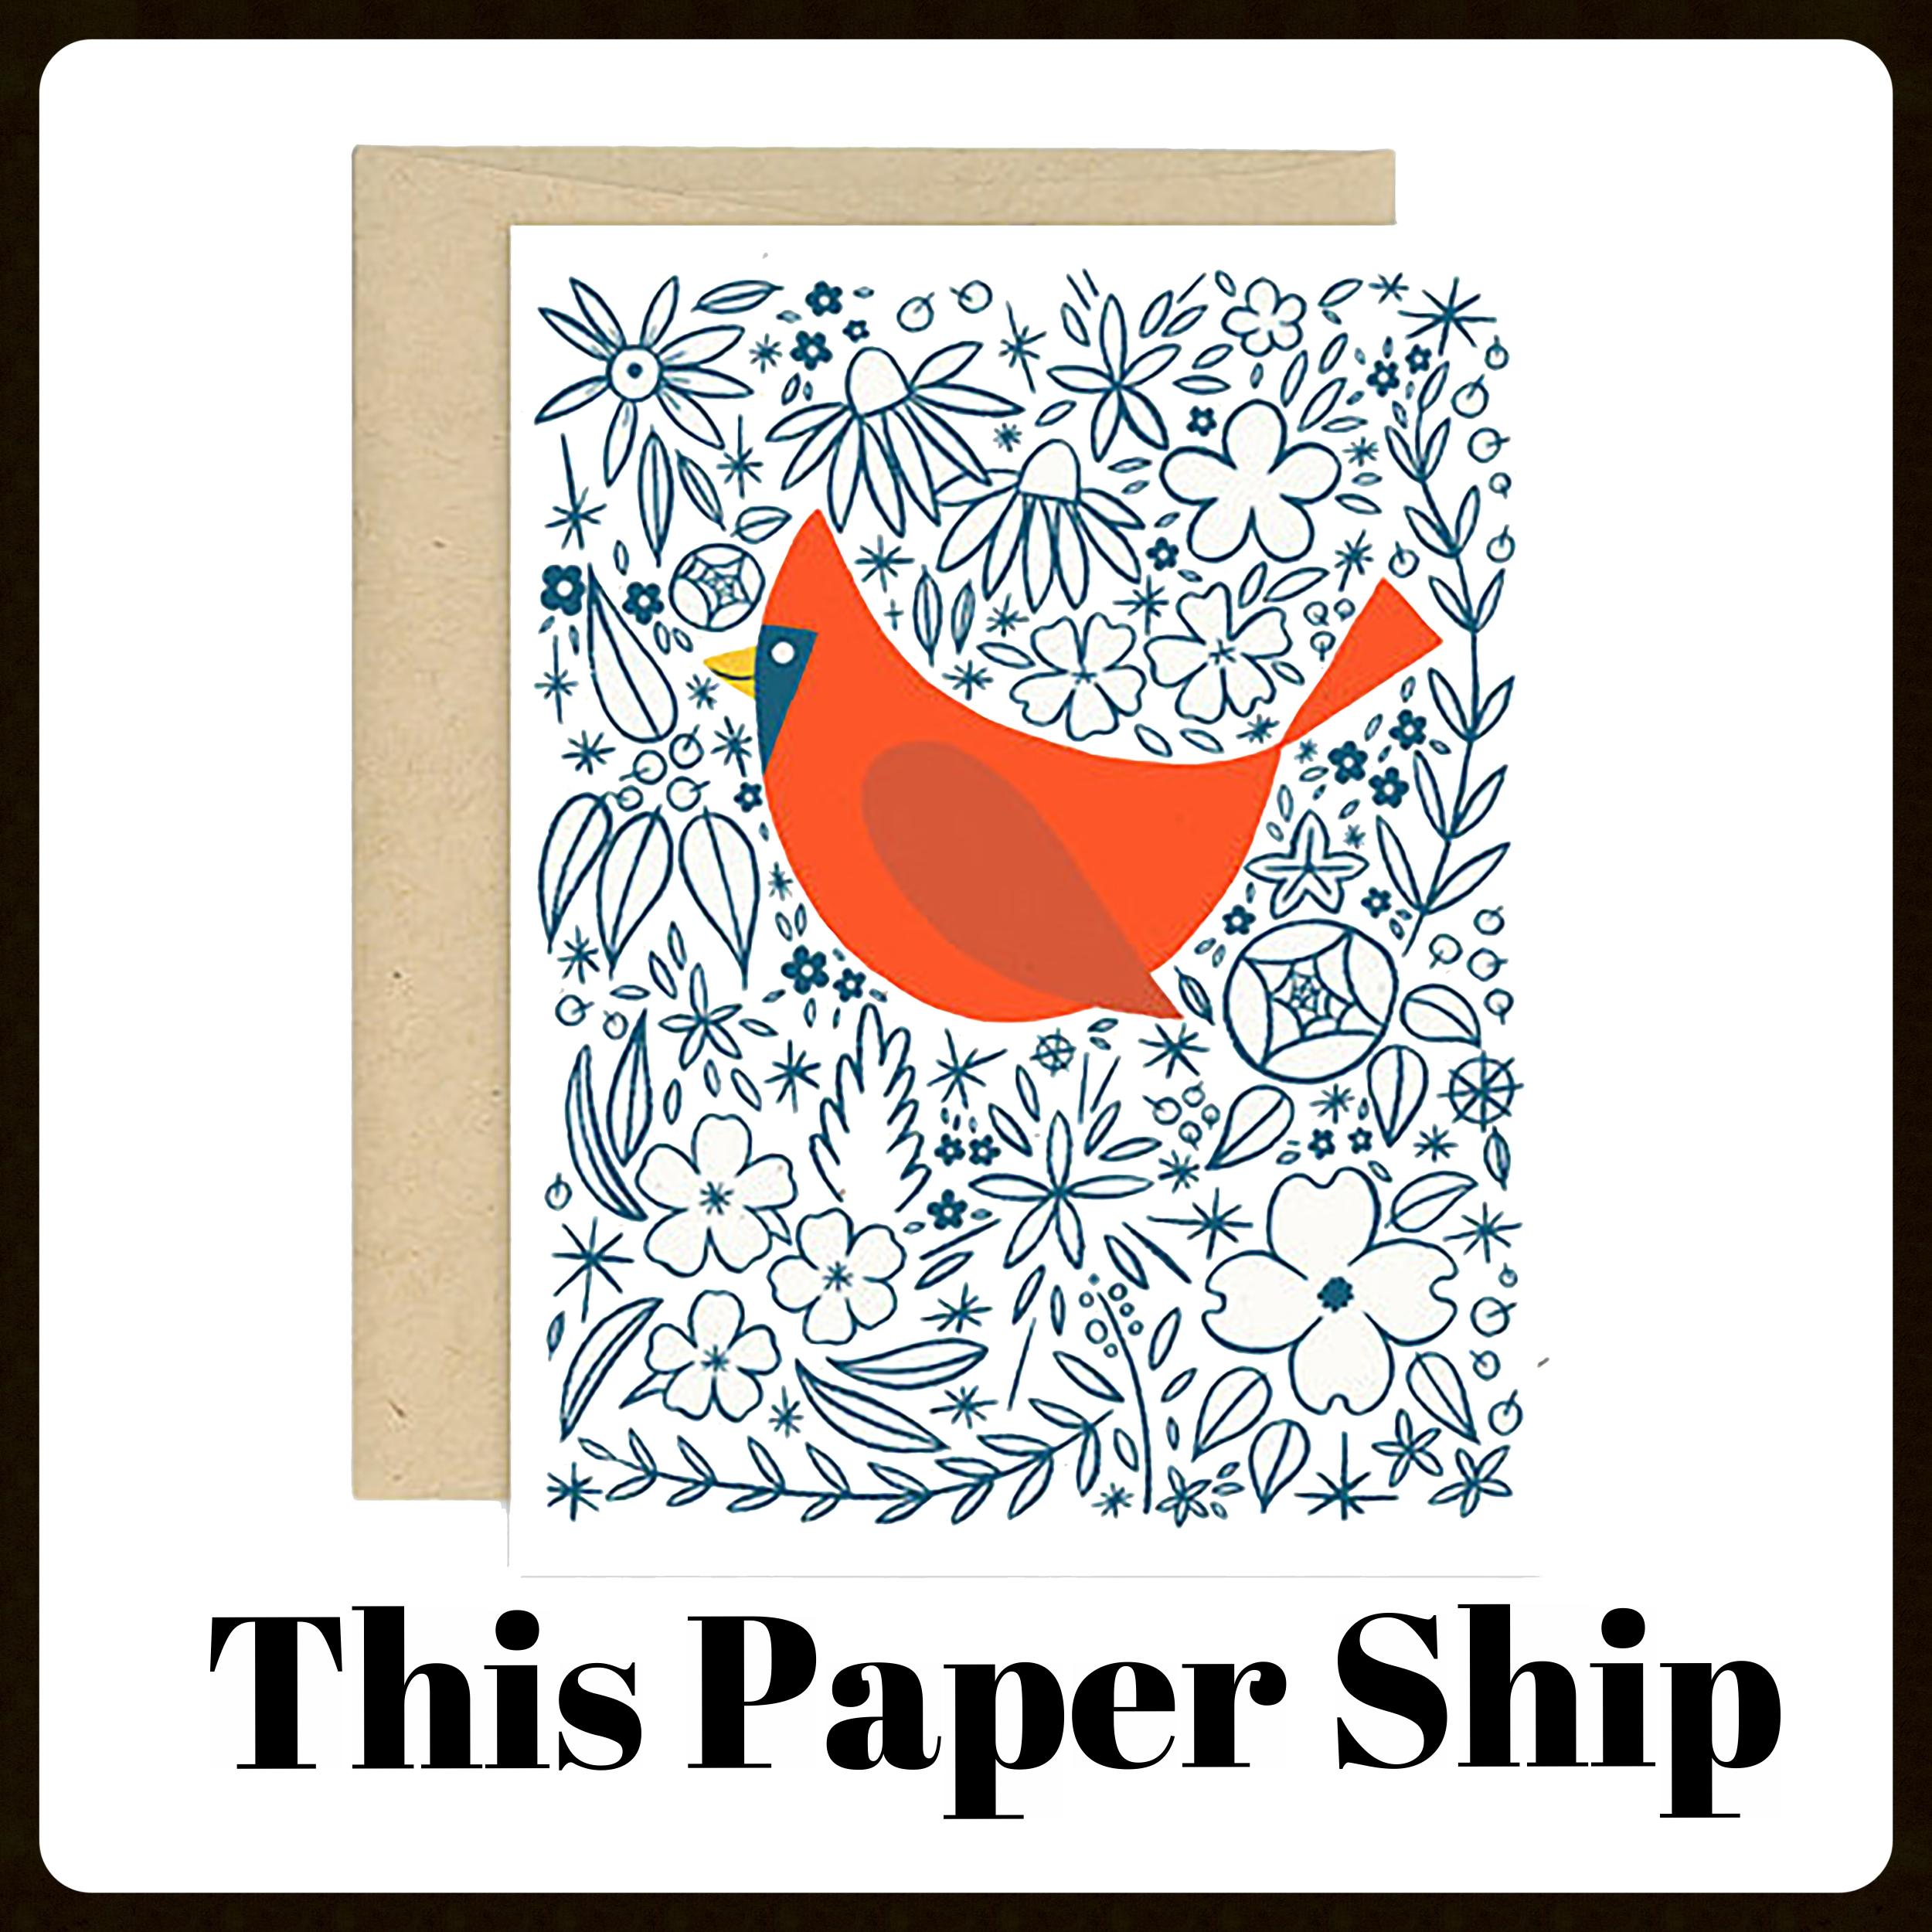 thispapership.jpg